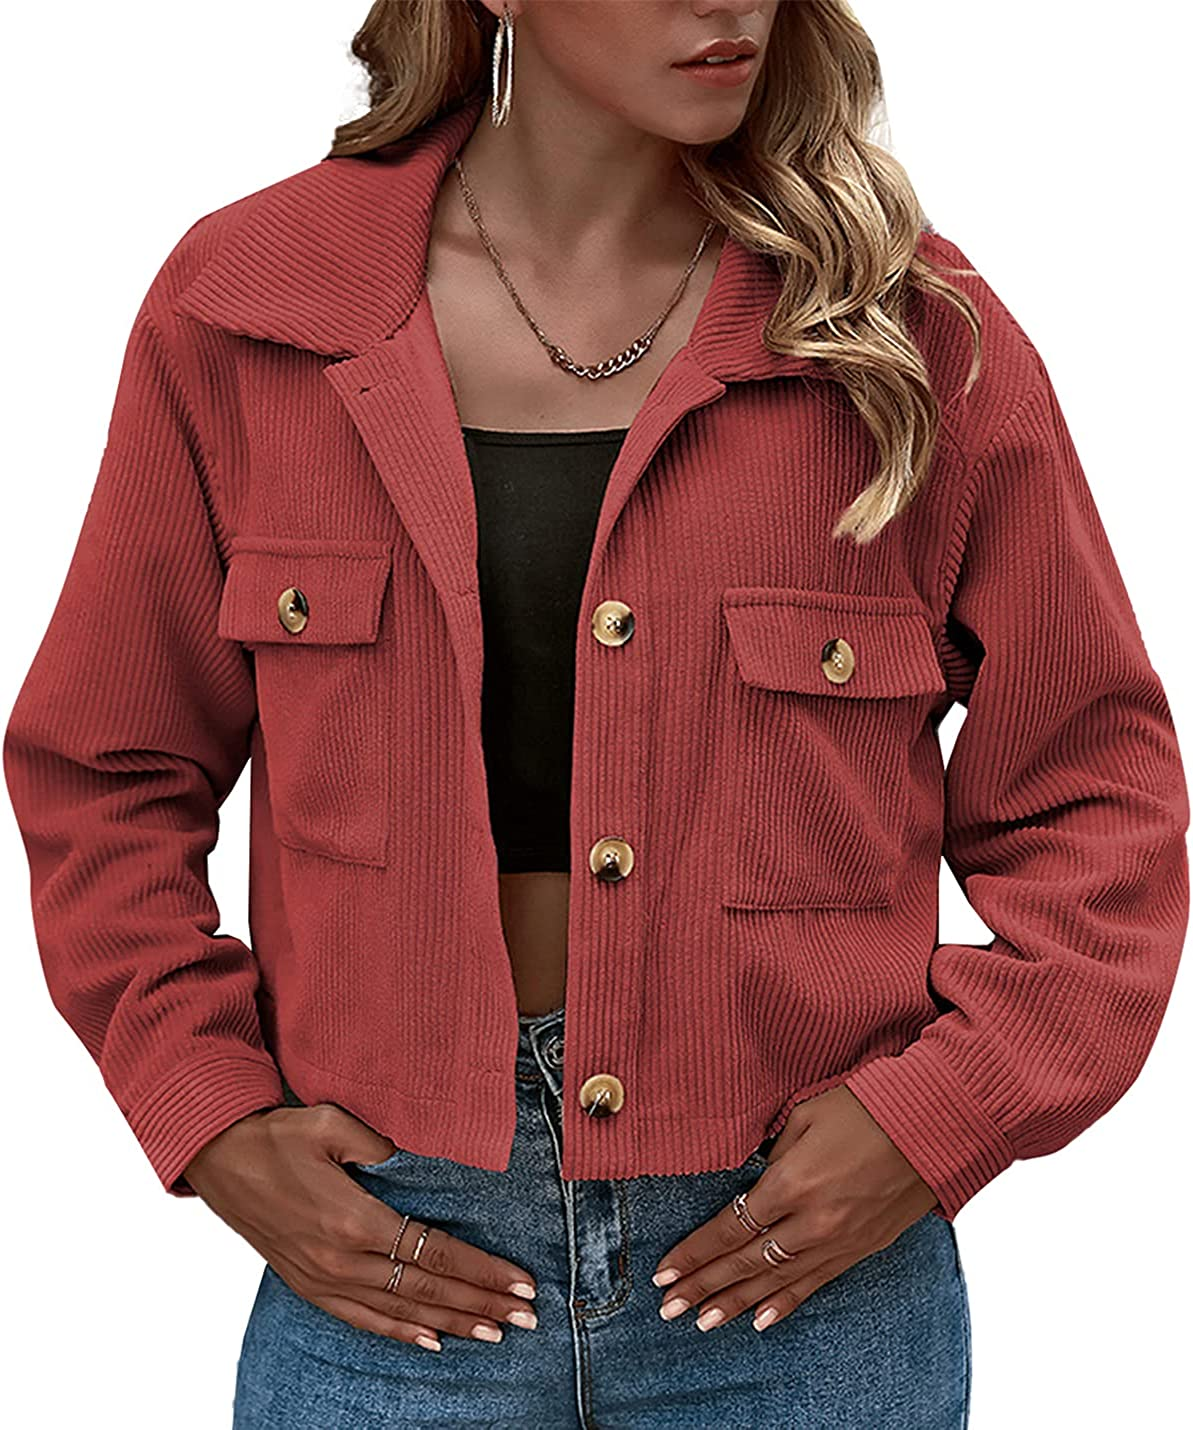 PEHMEA Women's Casual Long Sleeve Drop Shoulder Button Up Cropped Corduroy Jacket Coat